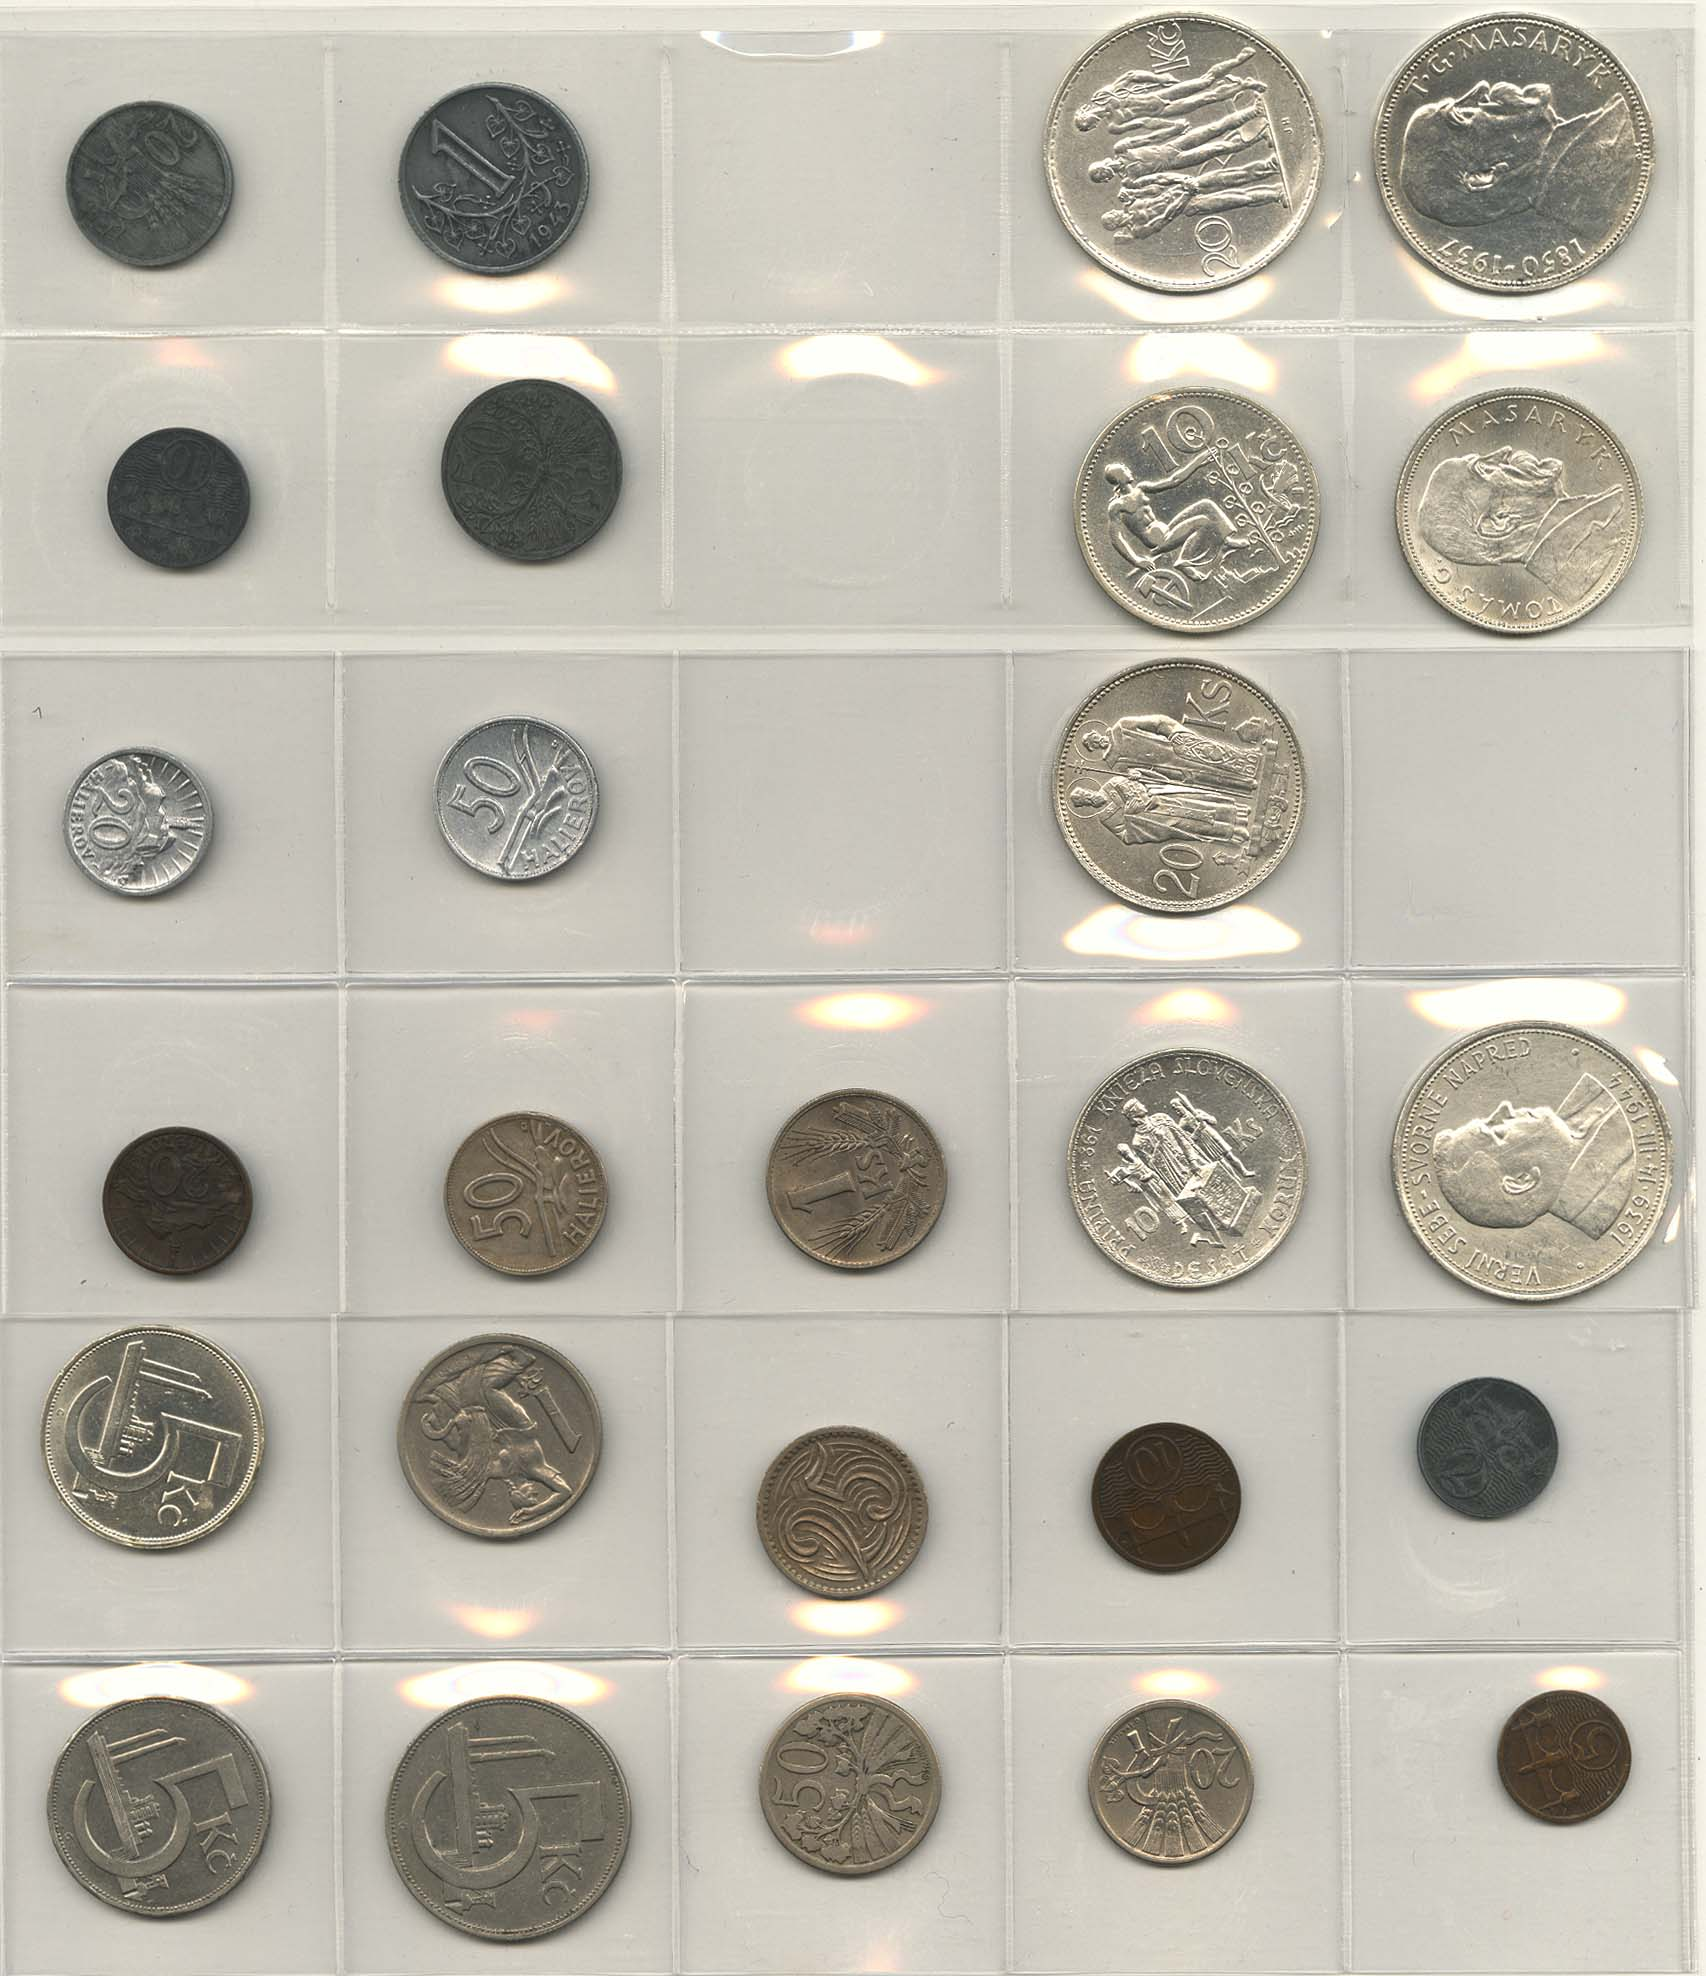 Lot 9338 - sammlungen Europa ab 1800 - Tschechoslowakei -  Auktionshaus Ulrich Felzmann GmbH & Co. KG Coins single lots